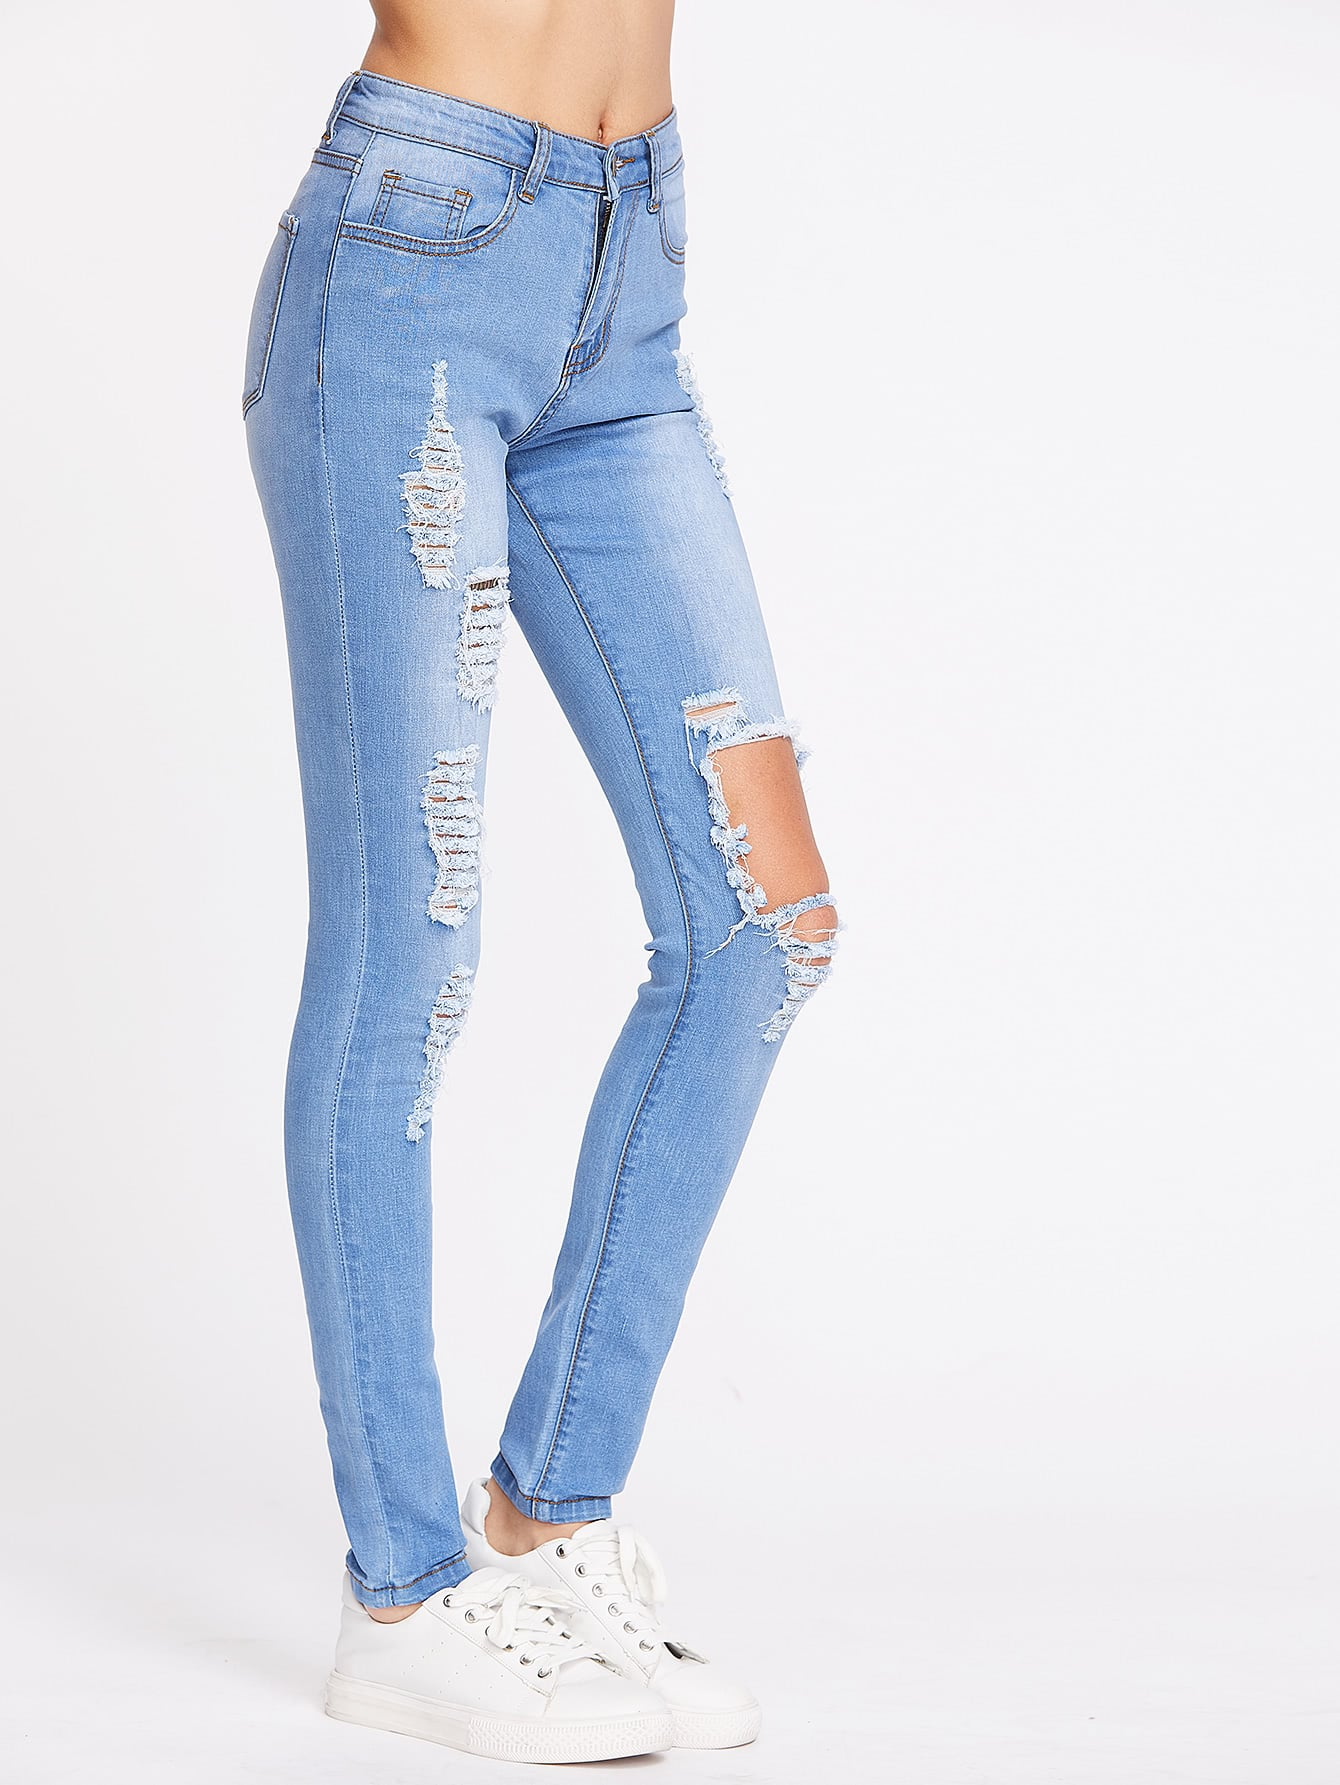 Bleach Wash Distressed Skinny Jeans embroidered distressed skinny jeans